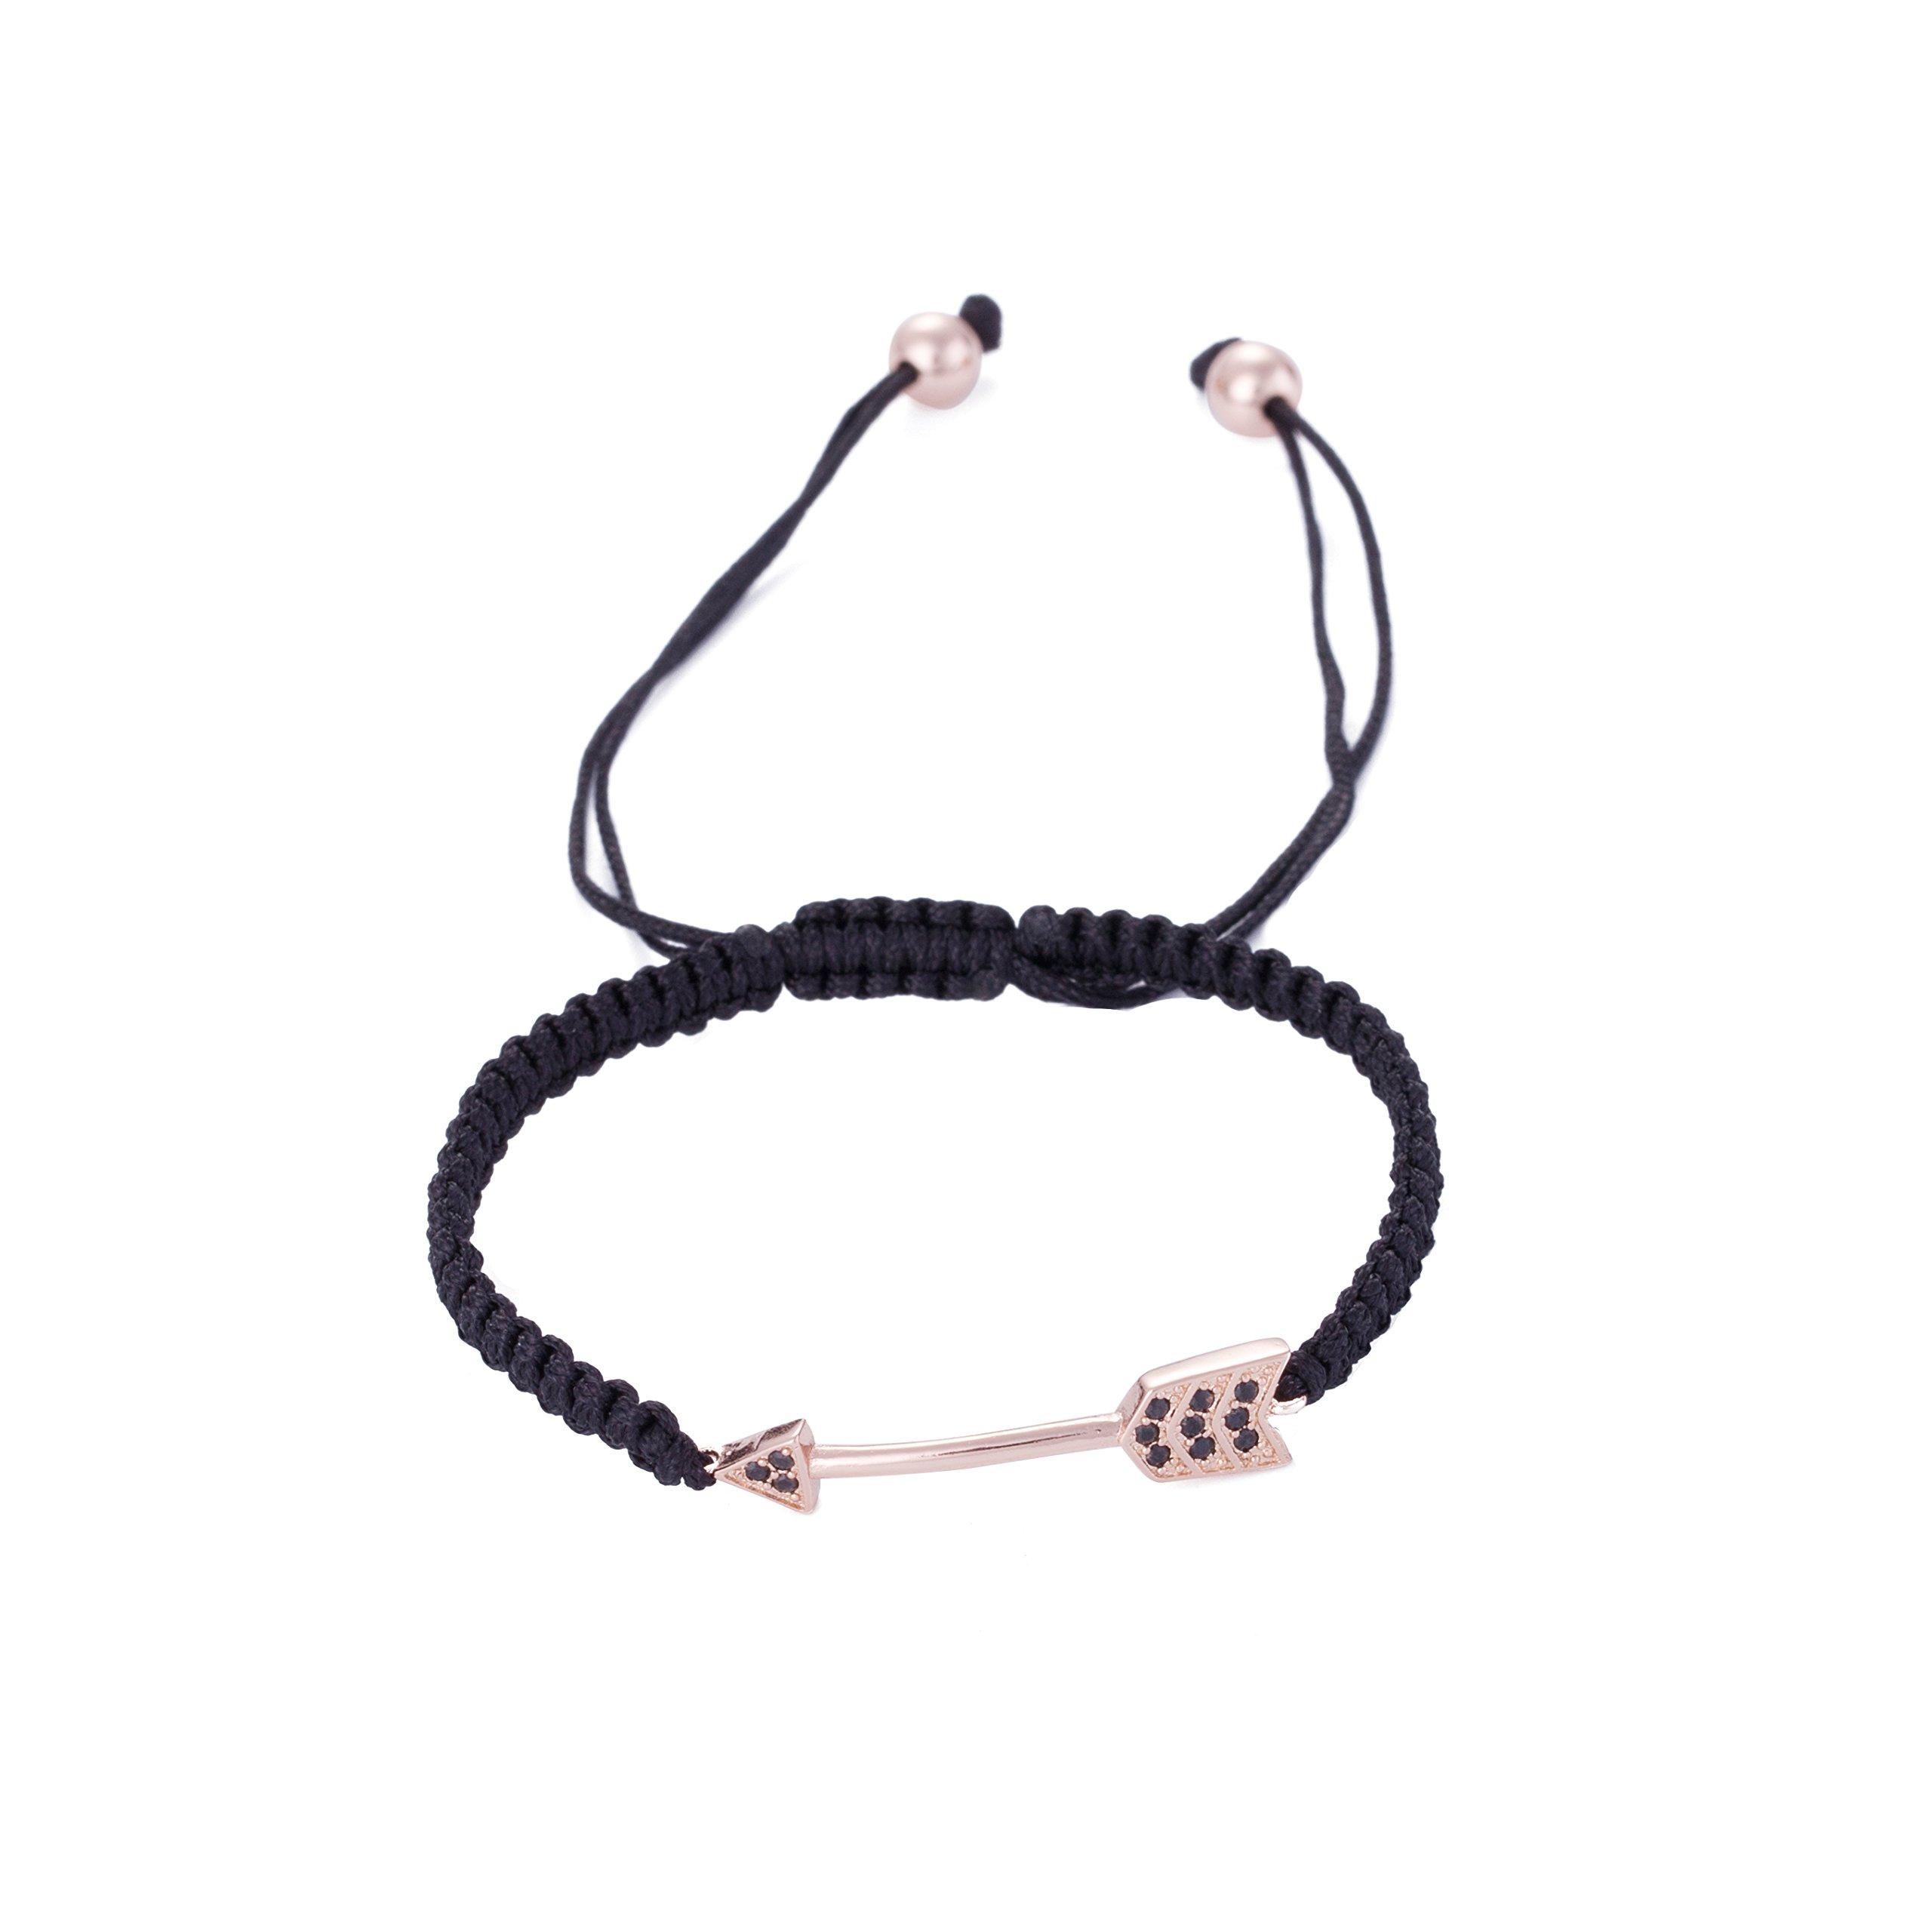 DDRICH Arrow Black Wax Rope Braid Bracelet Arrow Anklet Adjustable Macrame Friendship Bracelet Gift for Her (RG arrow)